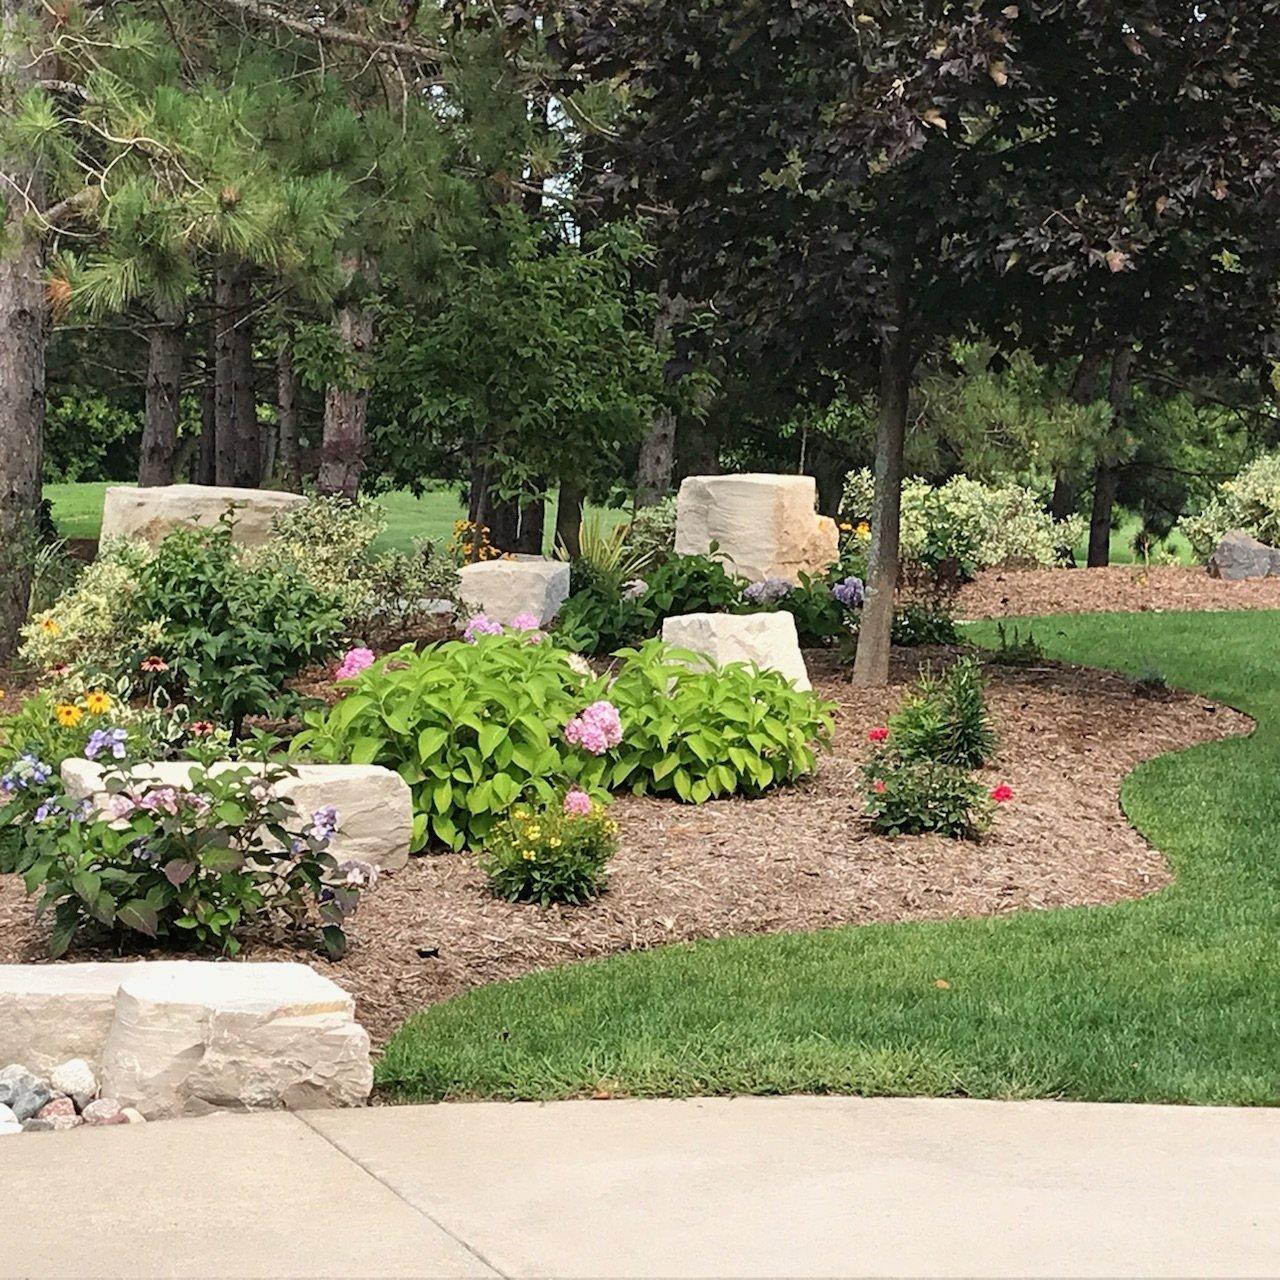 Beautiful Home Gardens Designs Ideas: Gorgeous Side Yard Garden Design Ideas For Your Beautiful